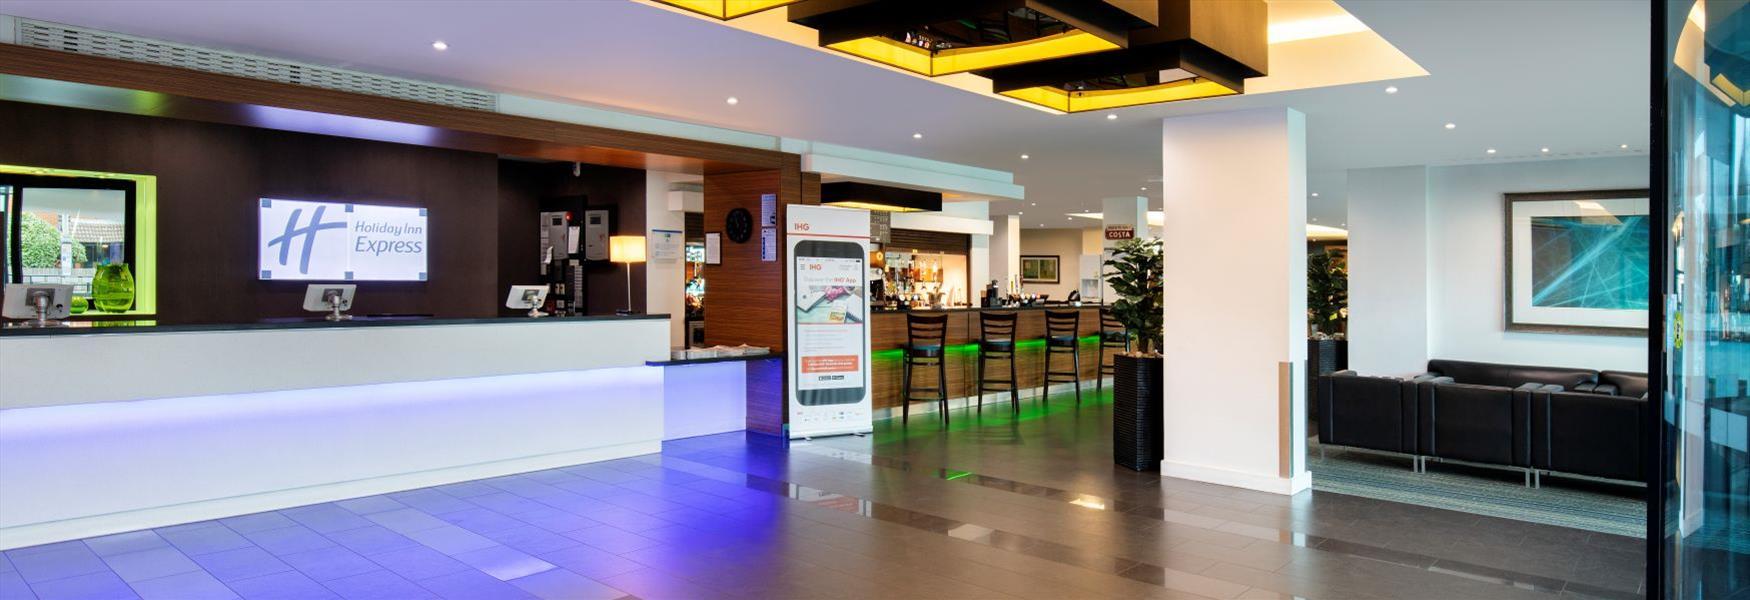 Comfortable, family-friendly Holiday Inn Express London Heathrow T5